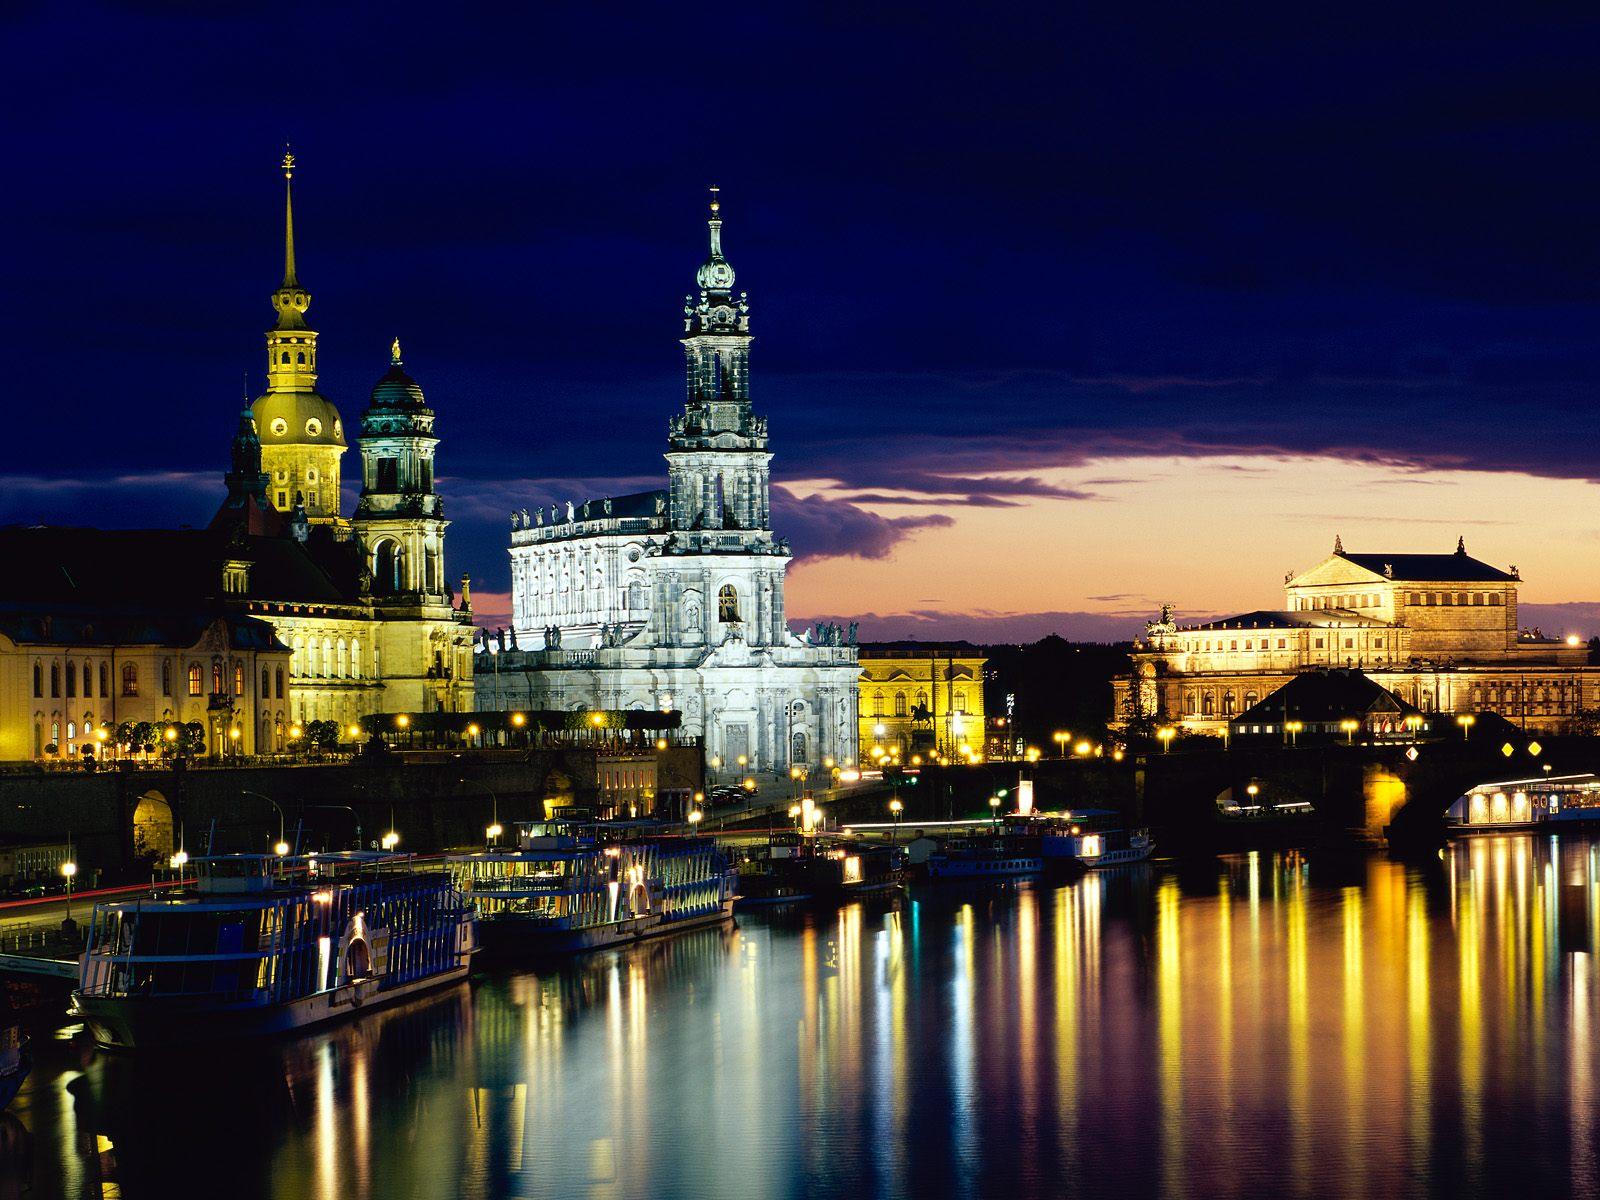 Desktop Wallpaper Gallery Travels Elbe   Dresden Germany 1600x1200